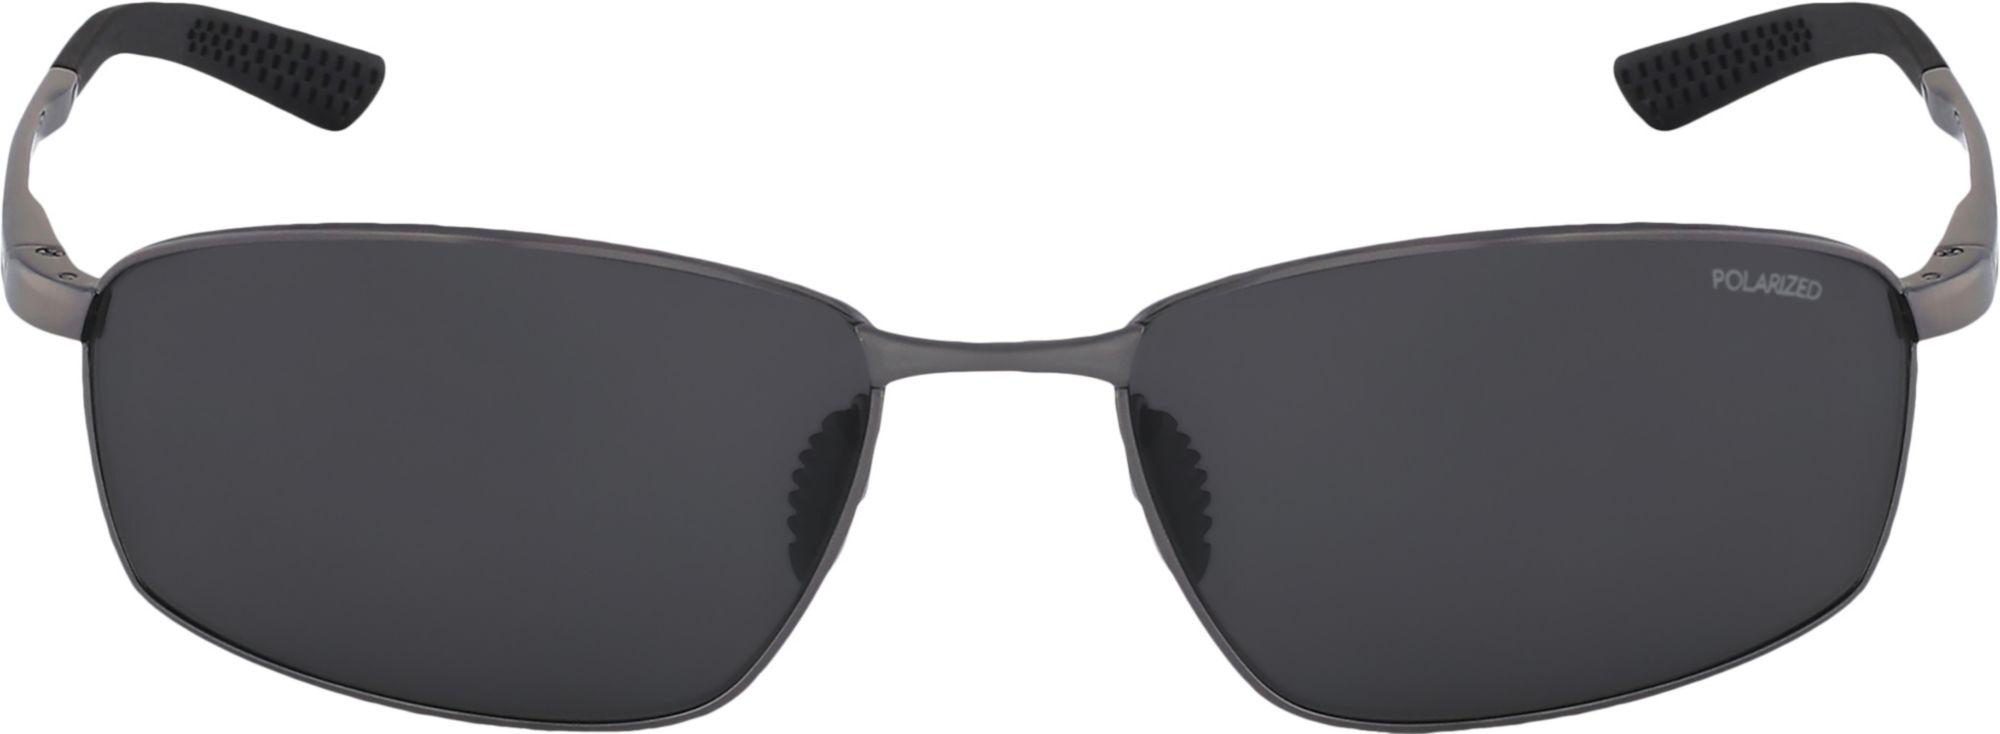 buy popular 0e10c c47f4 Lyst - Nike Avid Square Polarized Sunglasses for Men